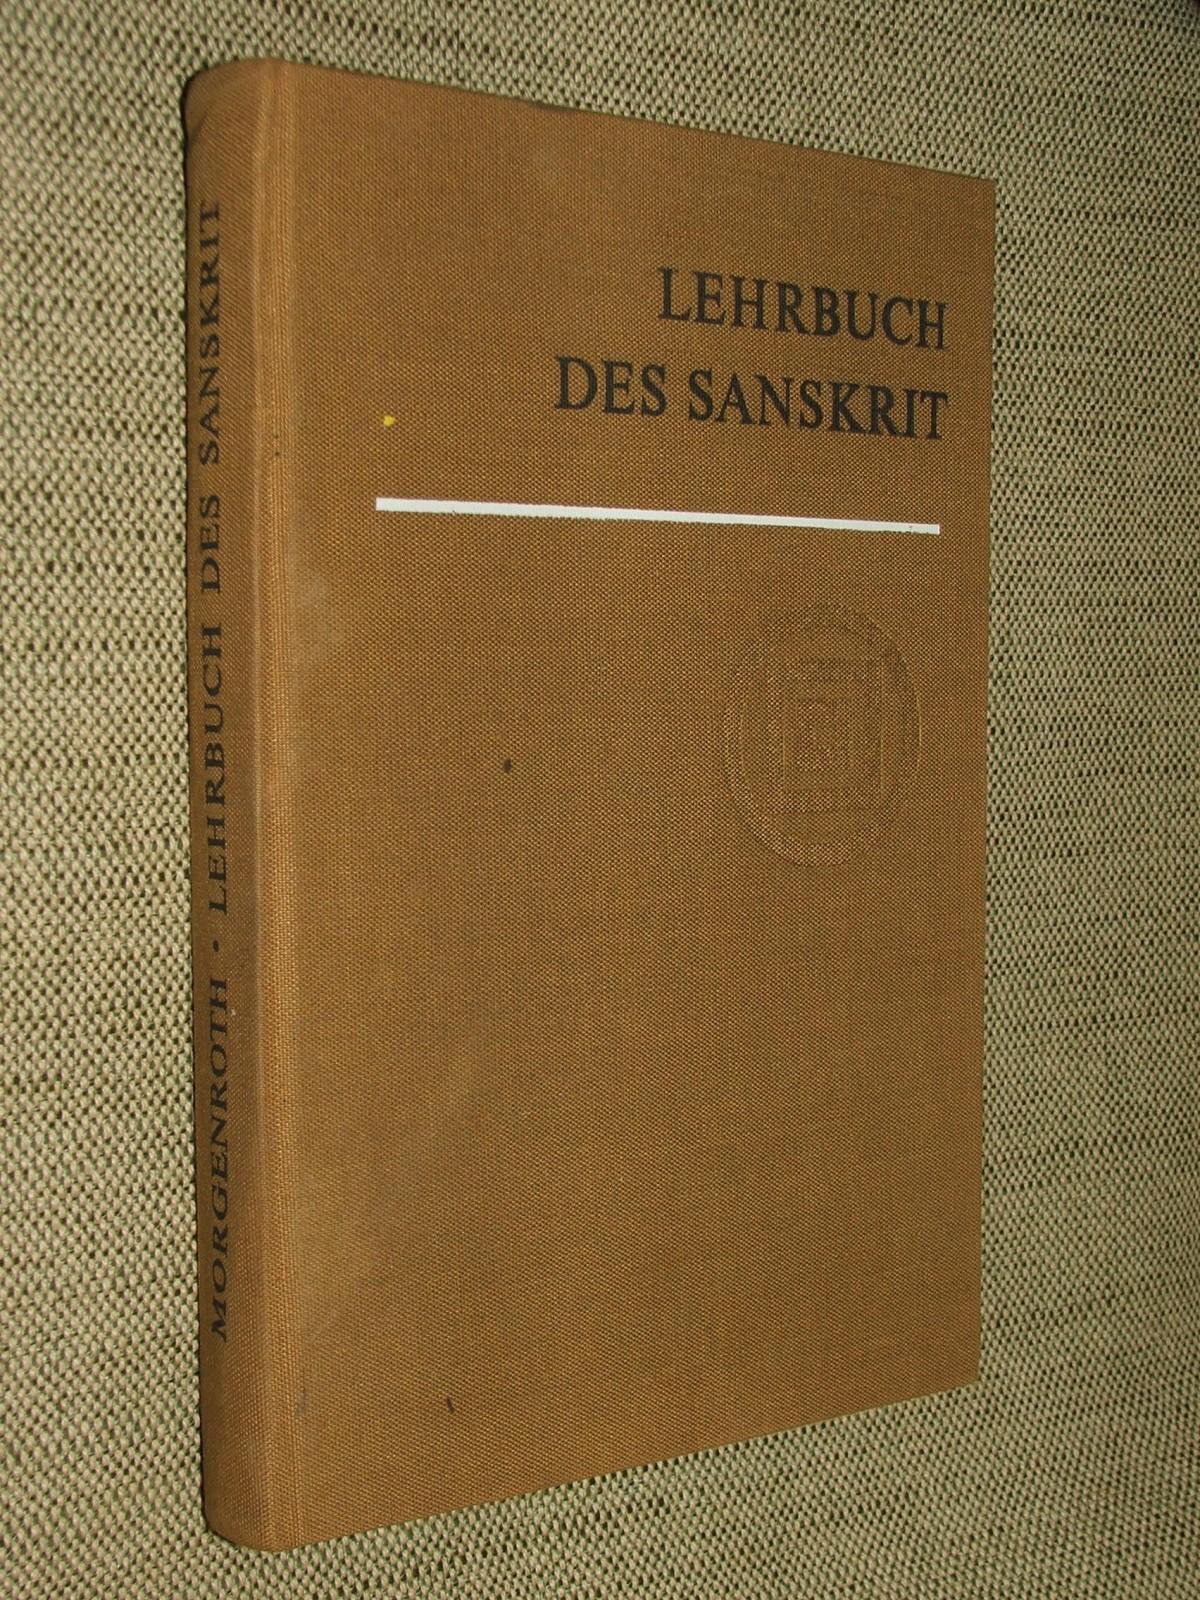 MORGENROTH, Wolfgang: Lehrbuch des Sanskrit